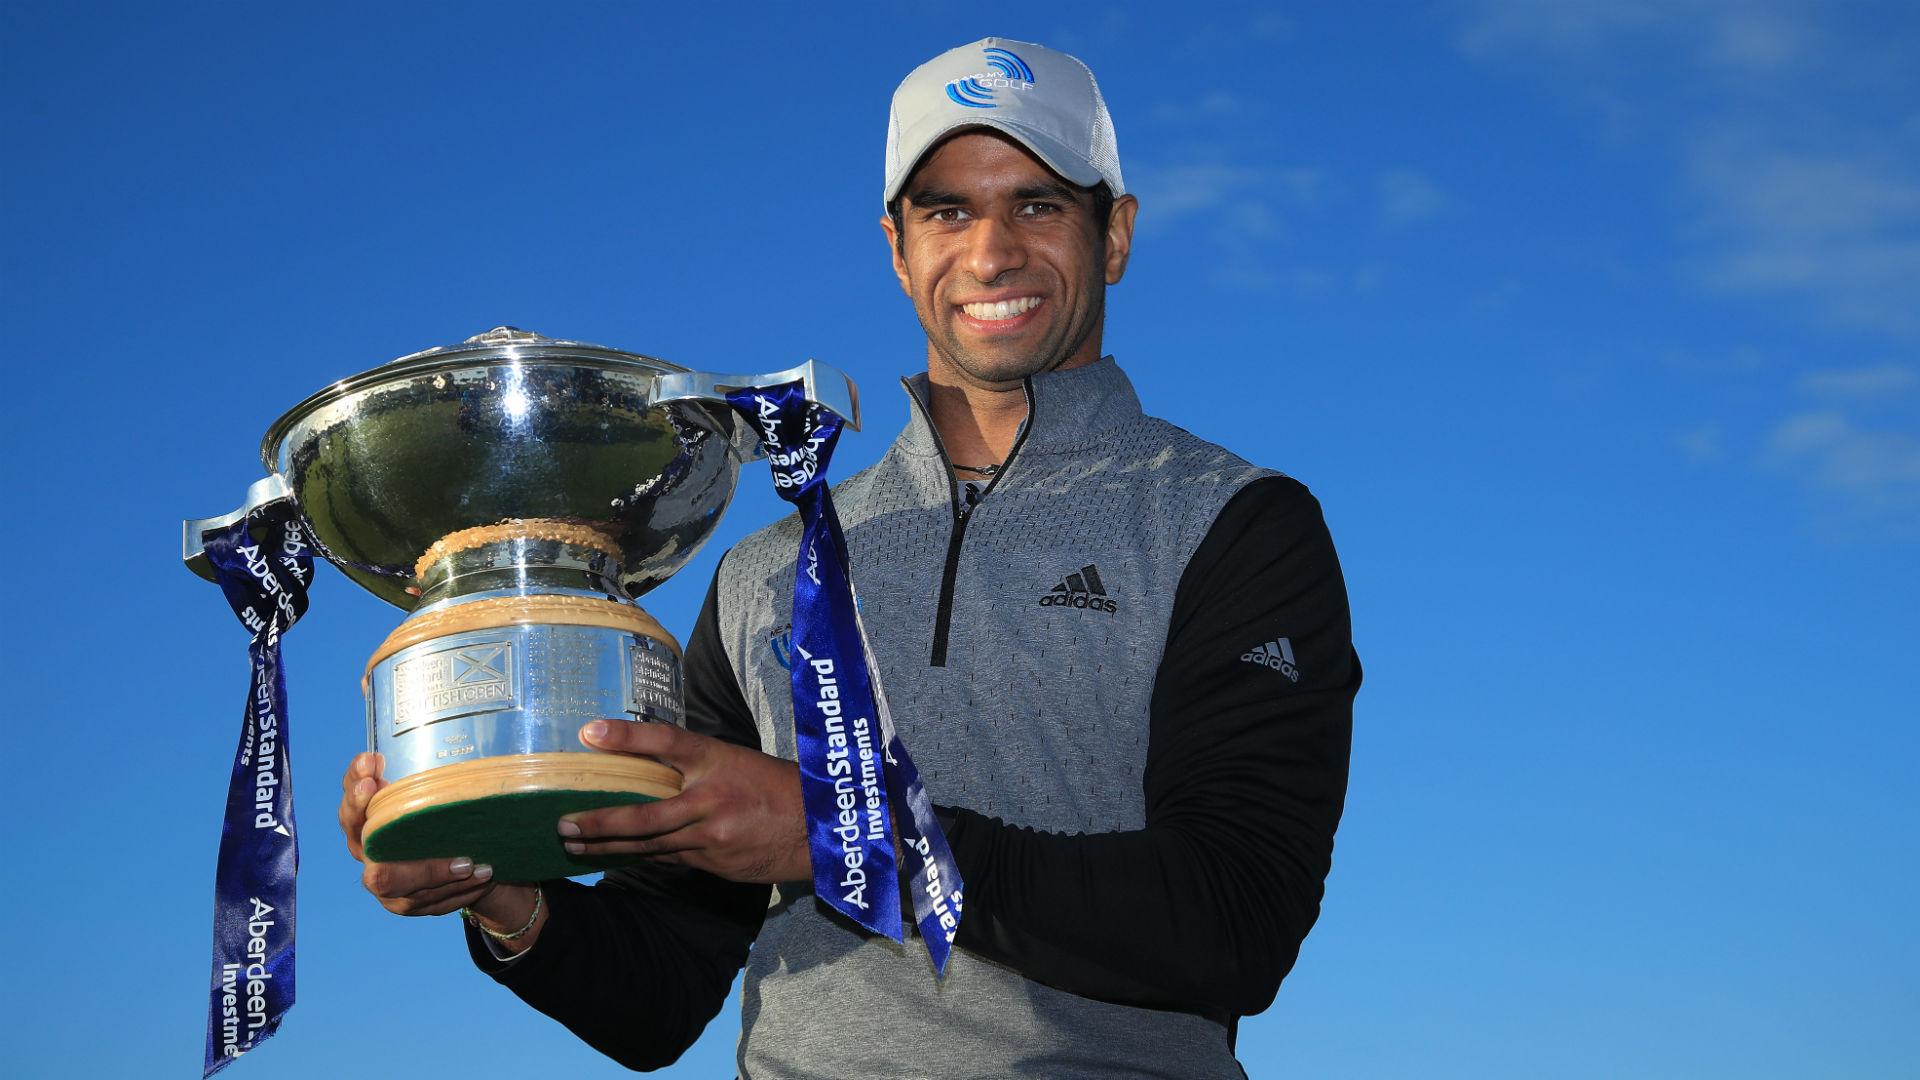 Rai edges Fleetwood in play-off to win Scottish Open